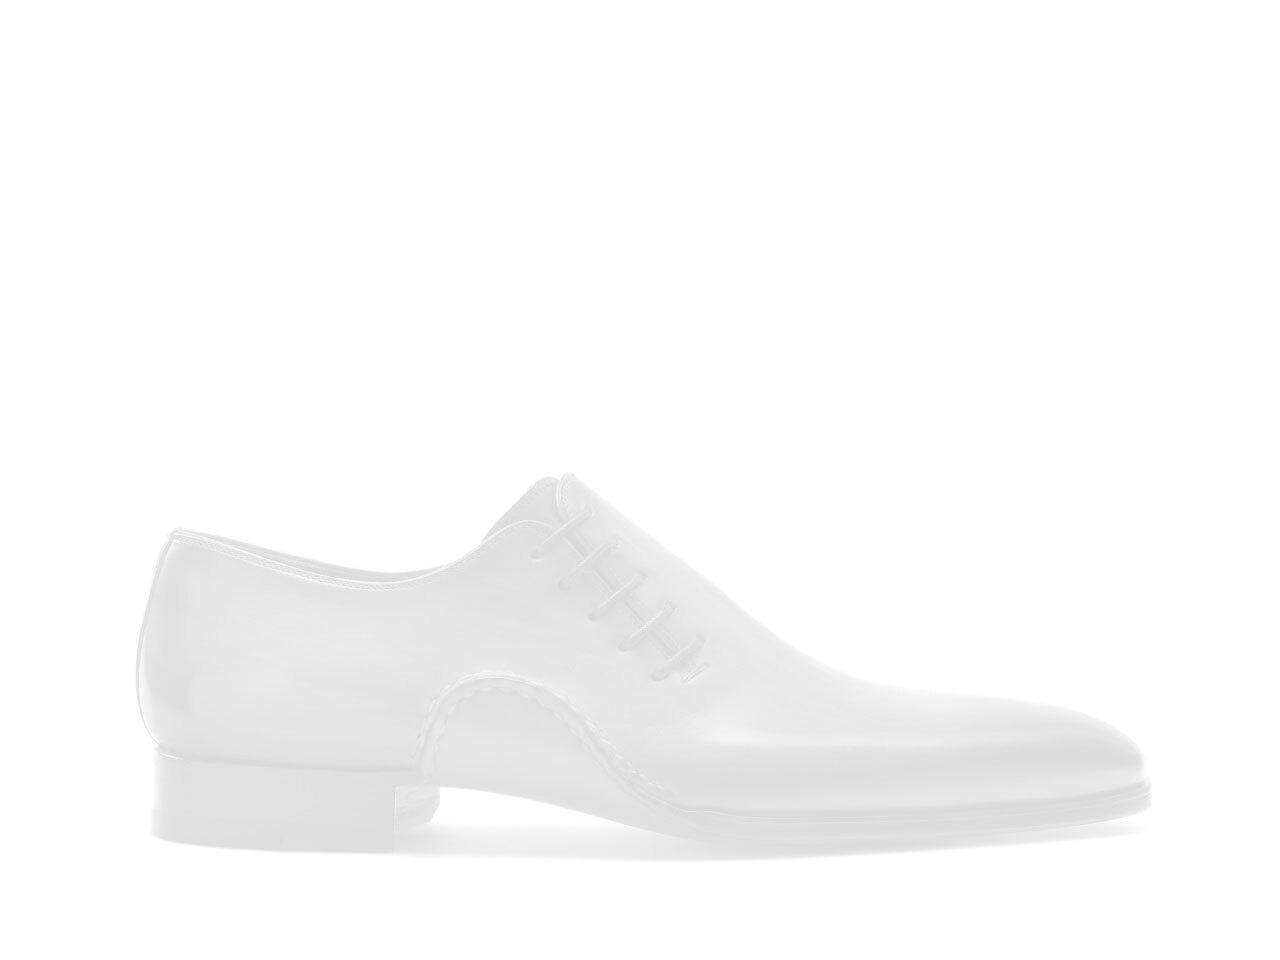 Sole of the Magnanni Romelo Black Men's Comfort Dress Shoes